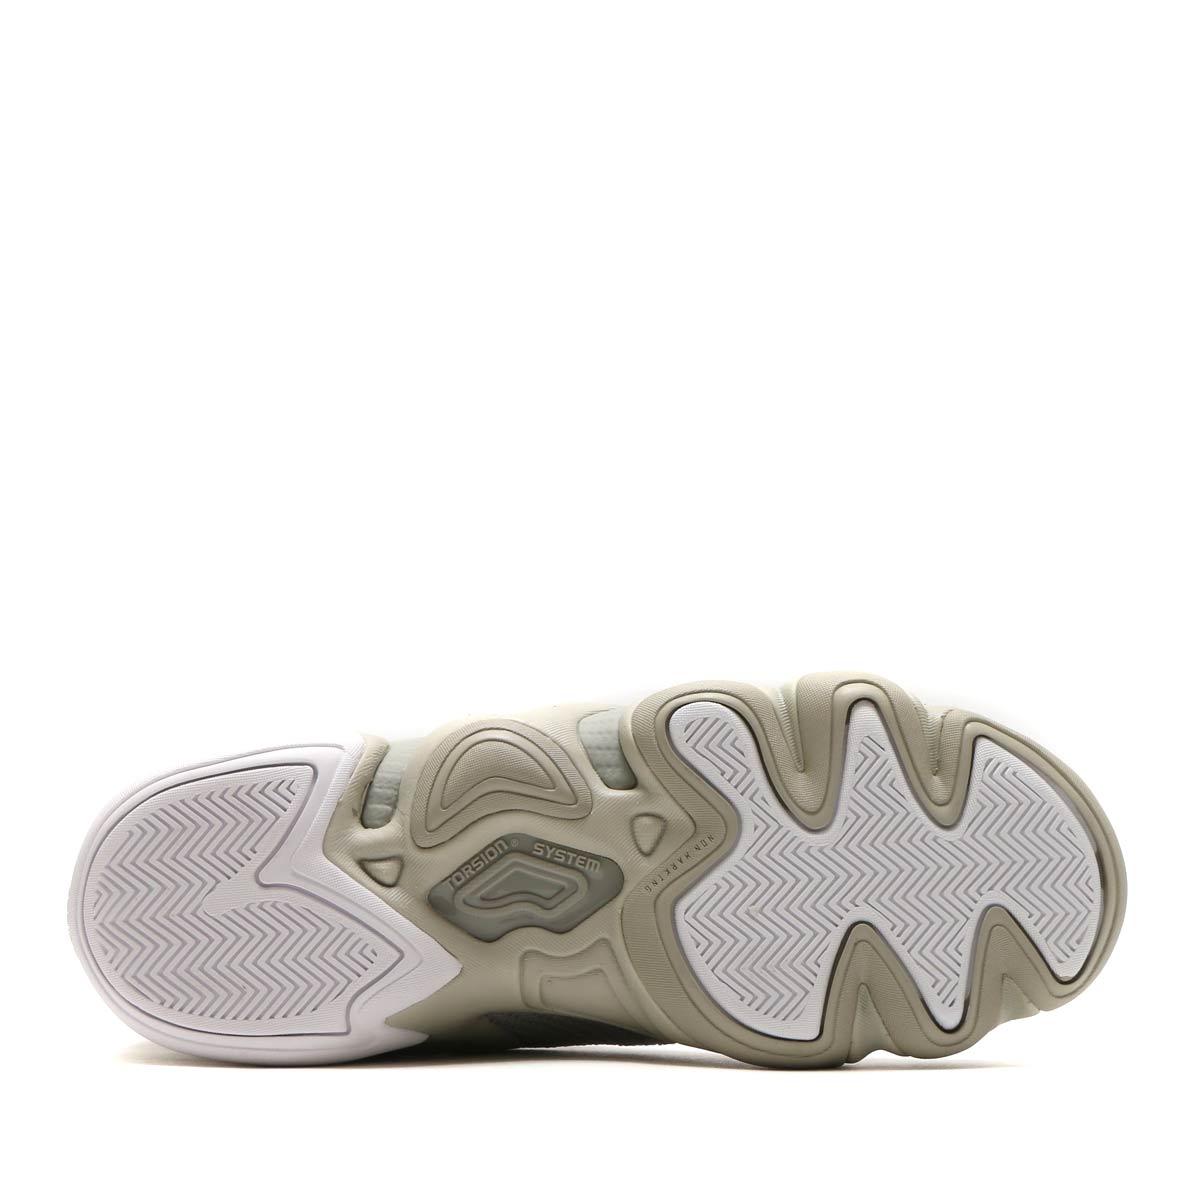 on sale 23eb7 aa028 adidas Originals CRAZY8ADV PK (Adidas originals crazy 8 ADV PK) (Sesame  Sesame Running White) 17FW-S